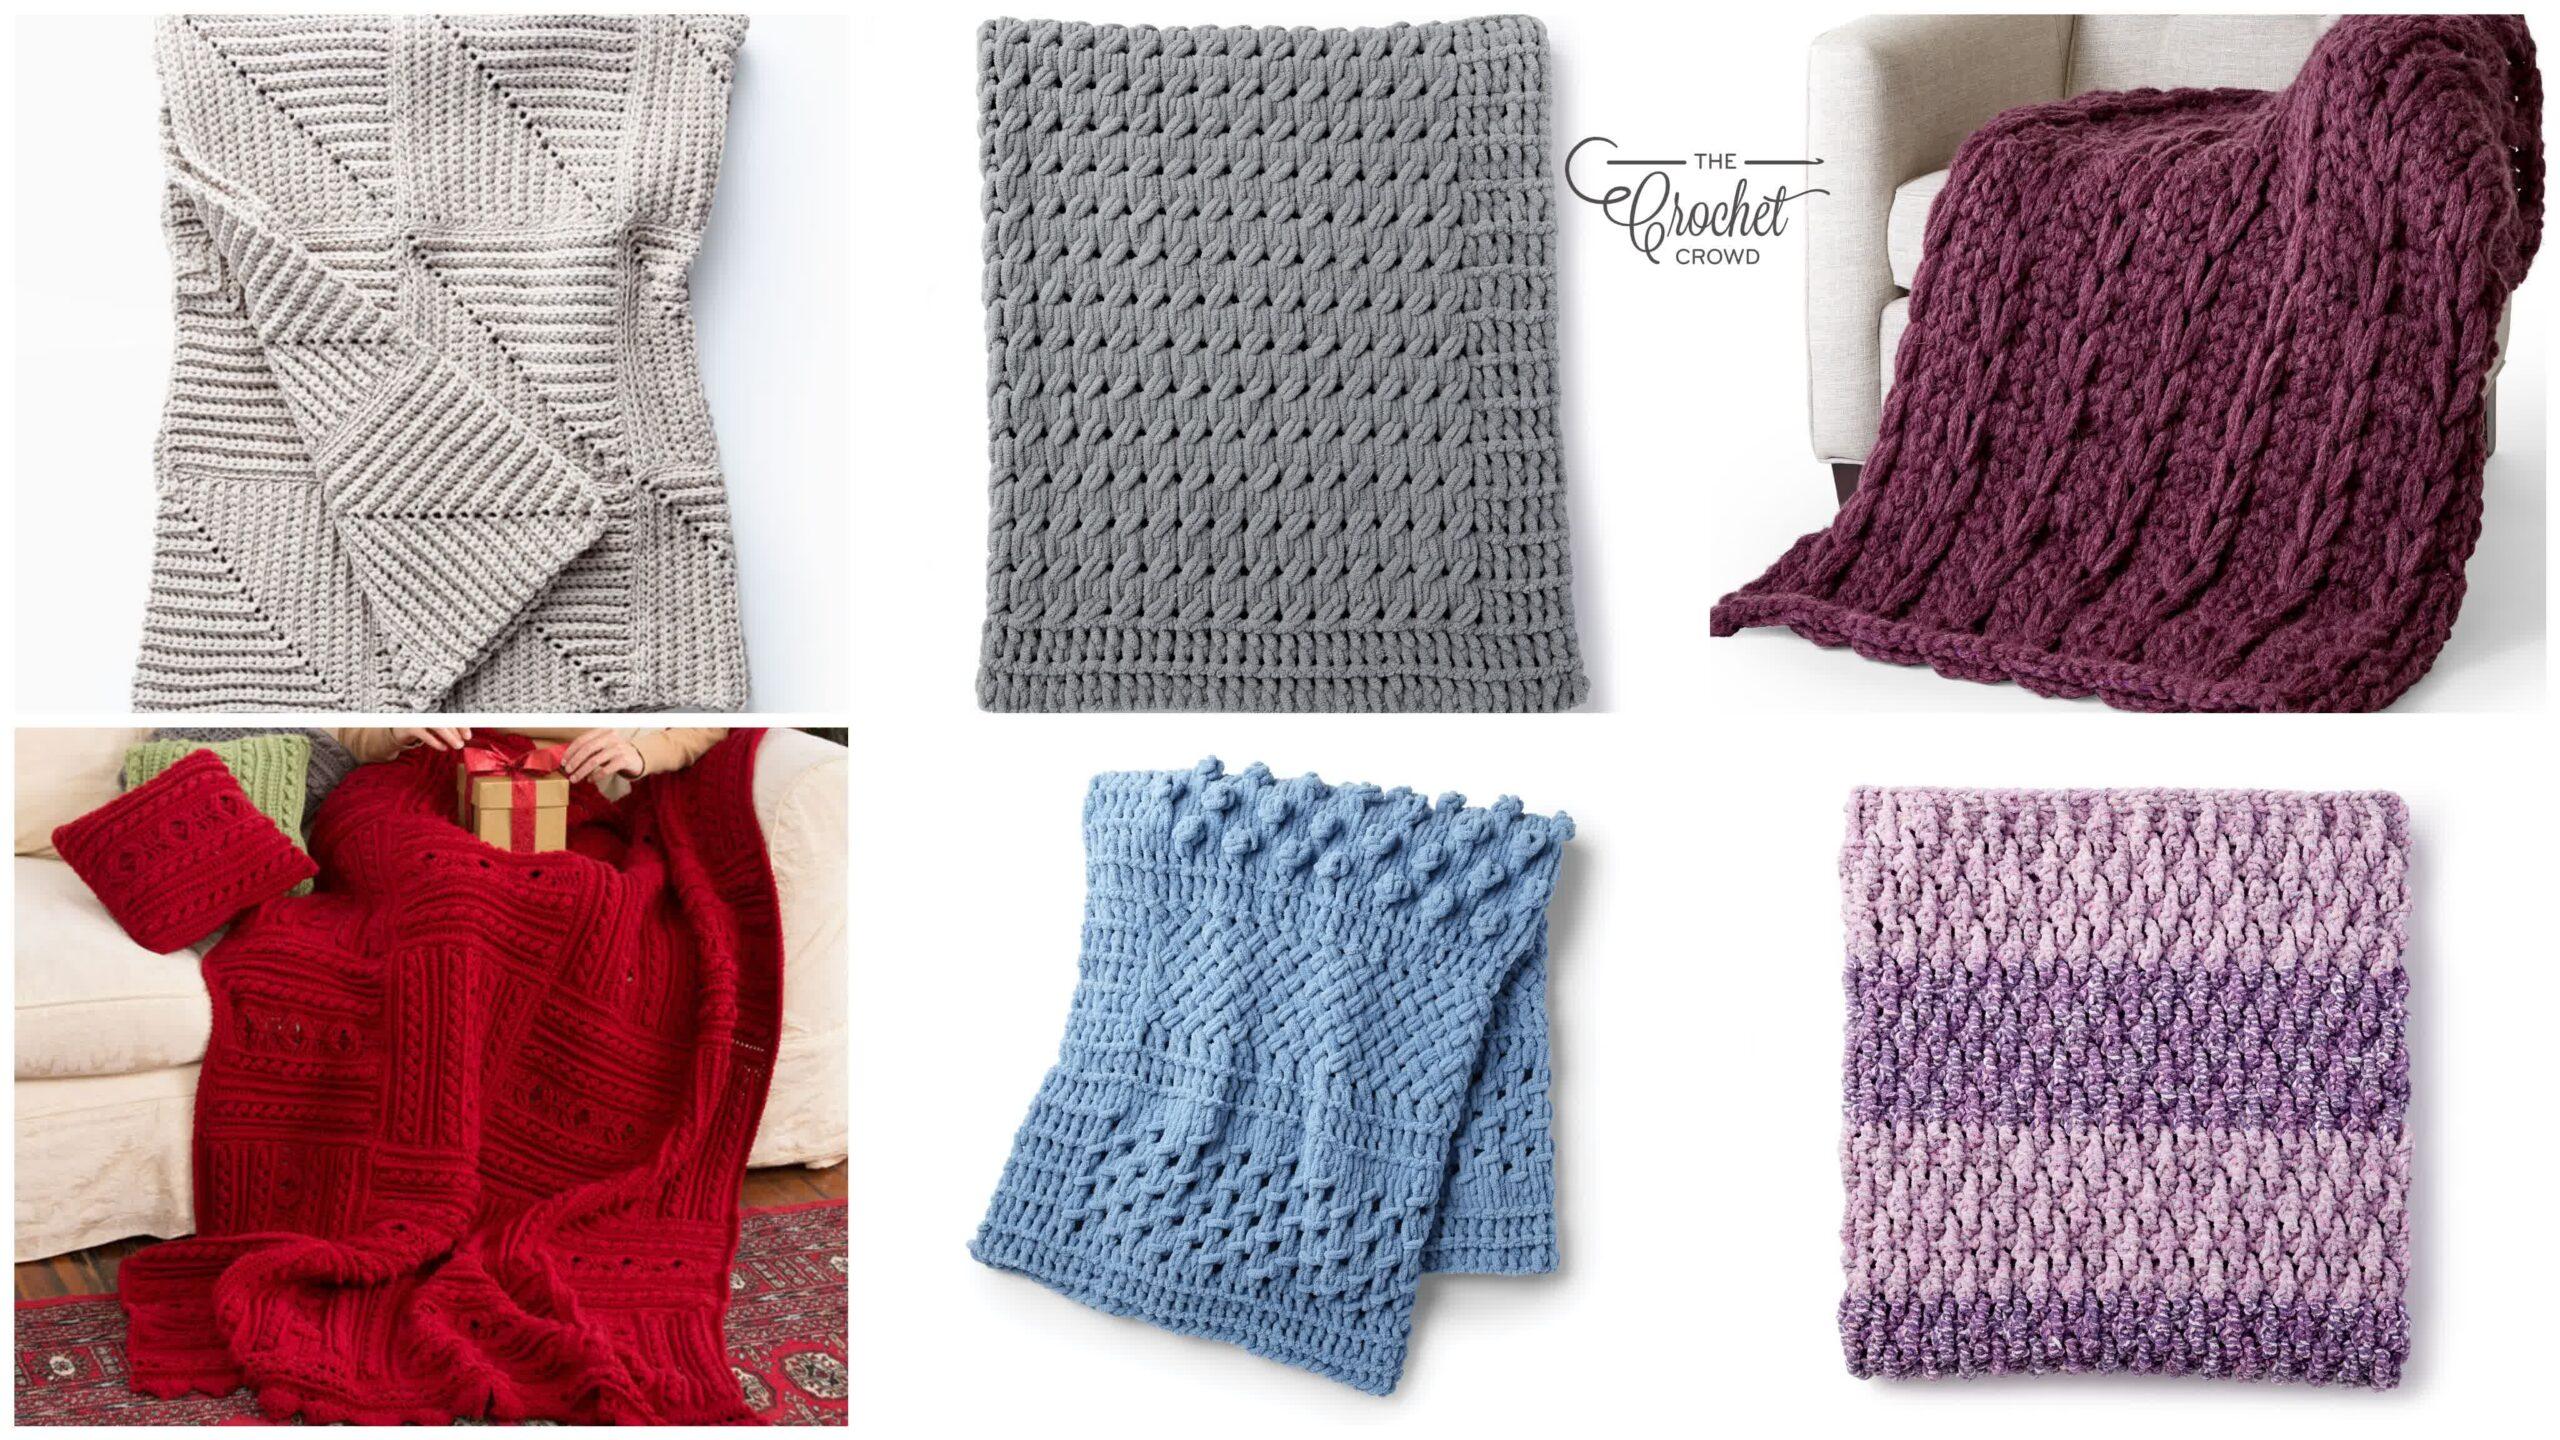 Crochet Textured Blanket Patterns